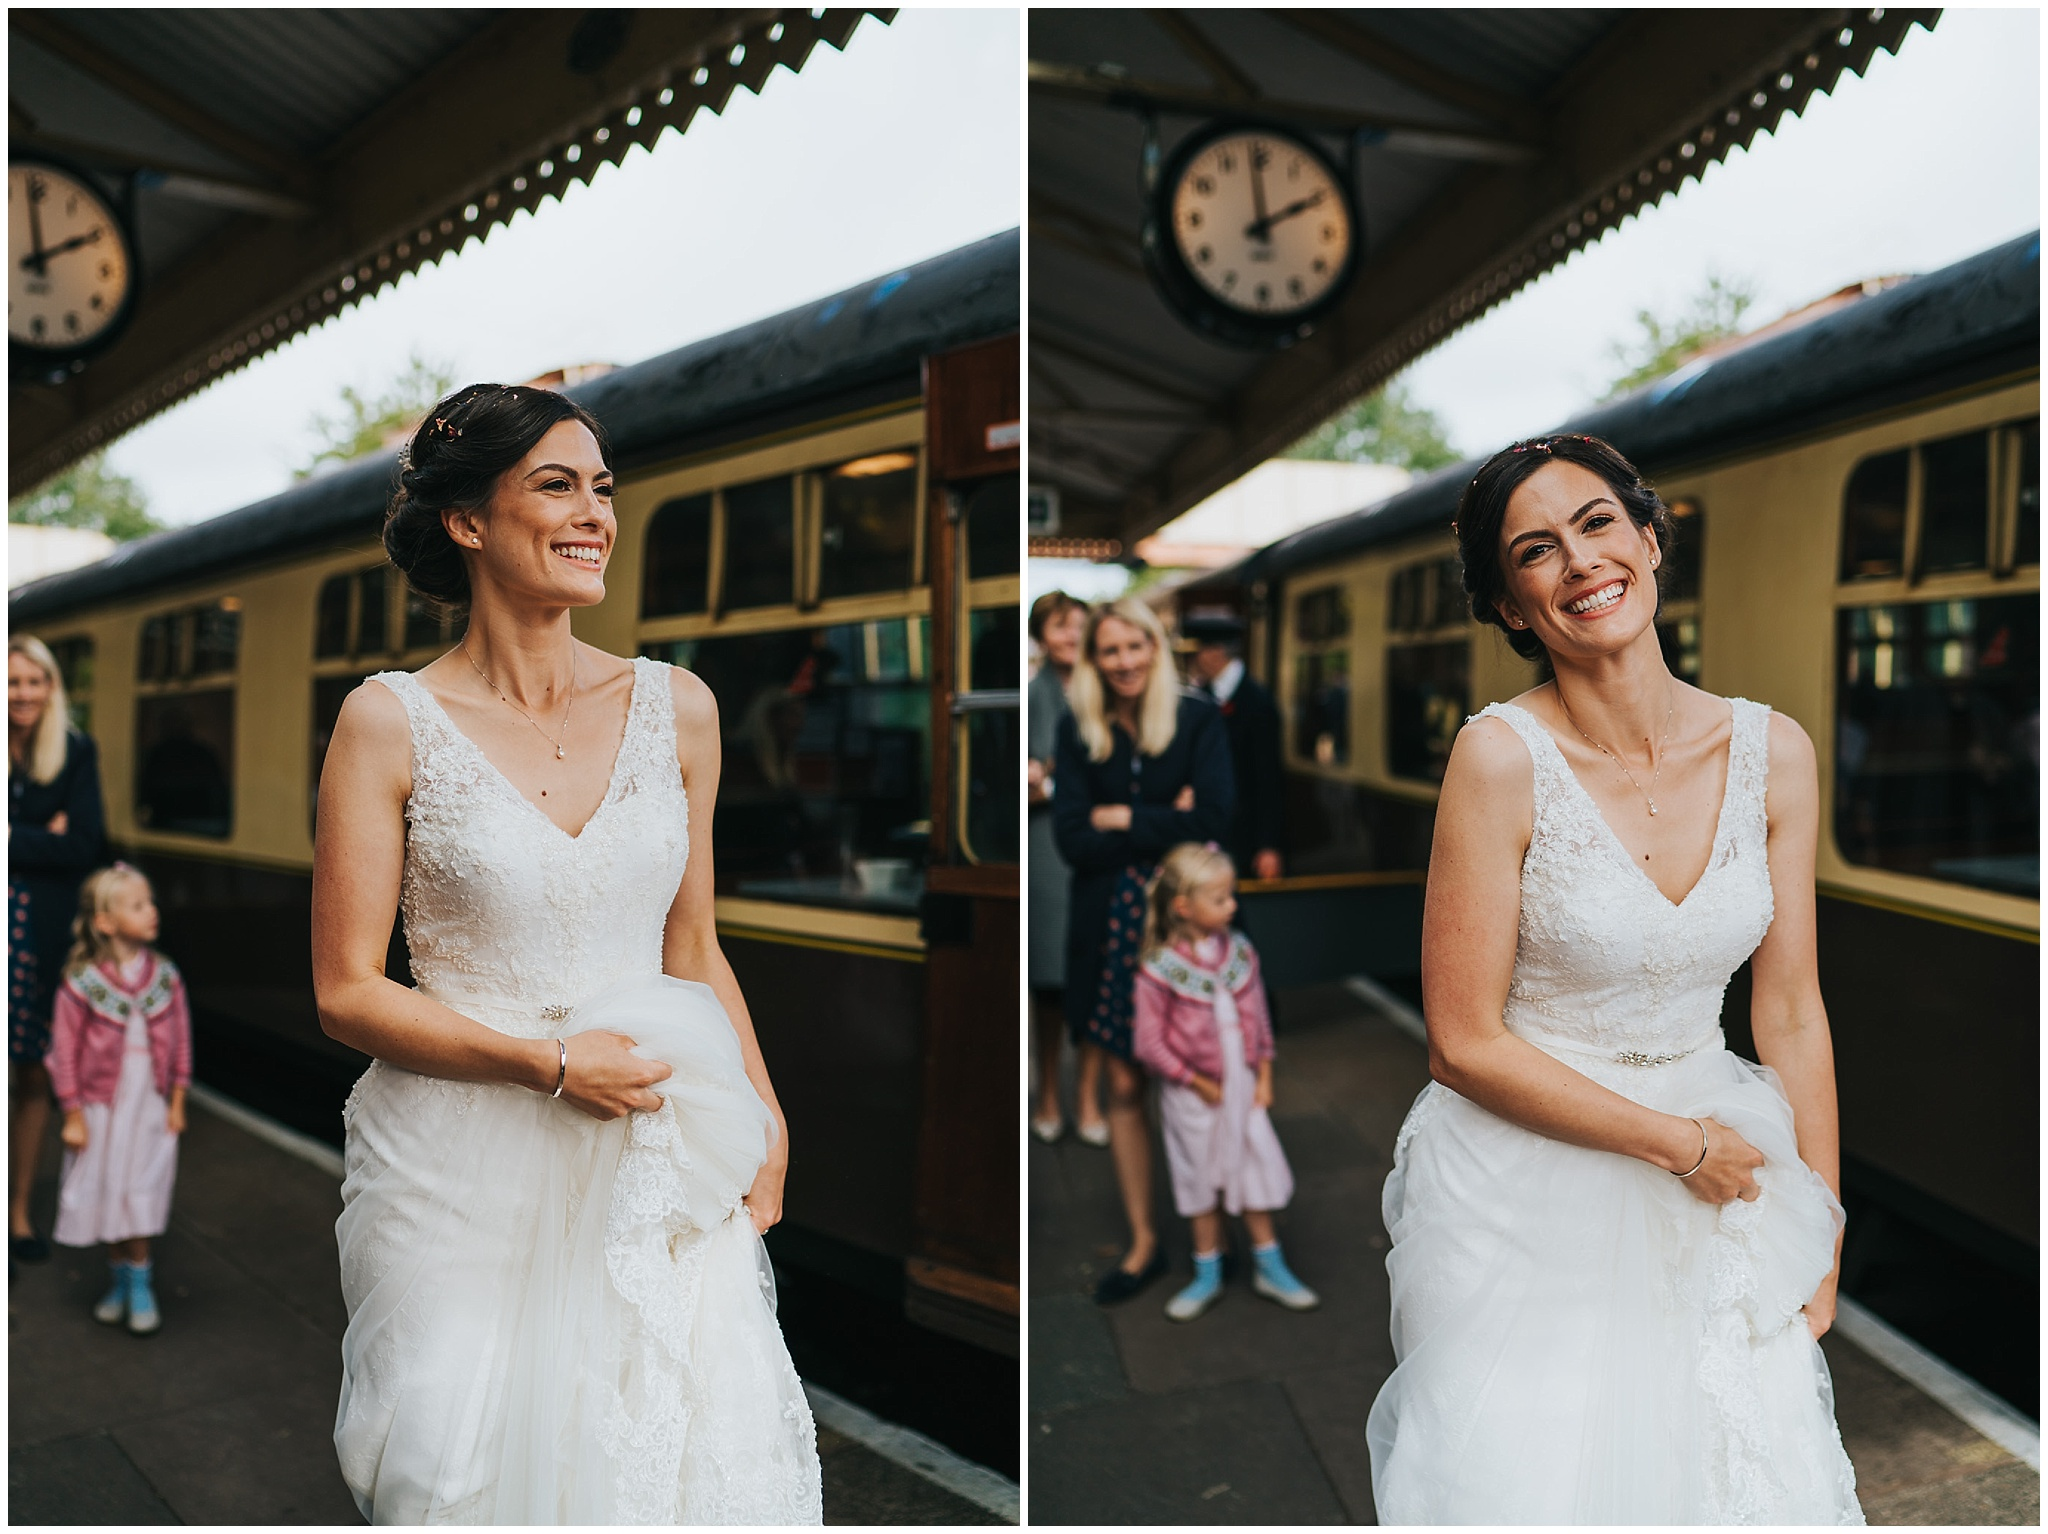 Stanway House Gloucester wedding photography055